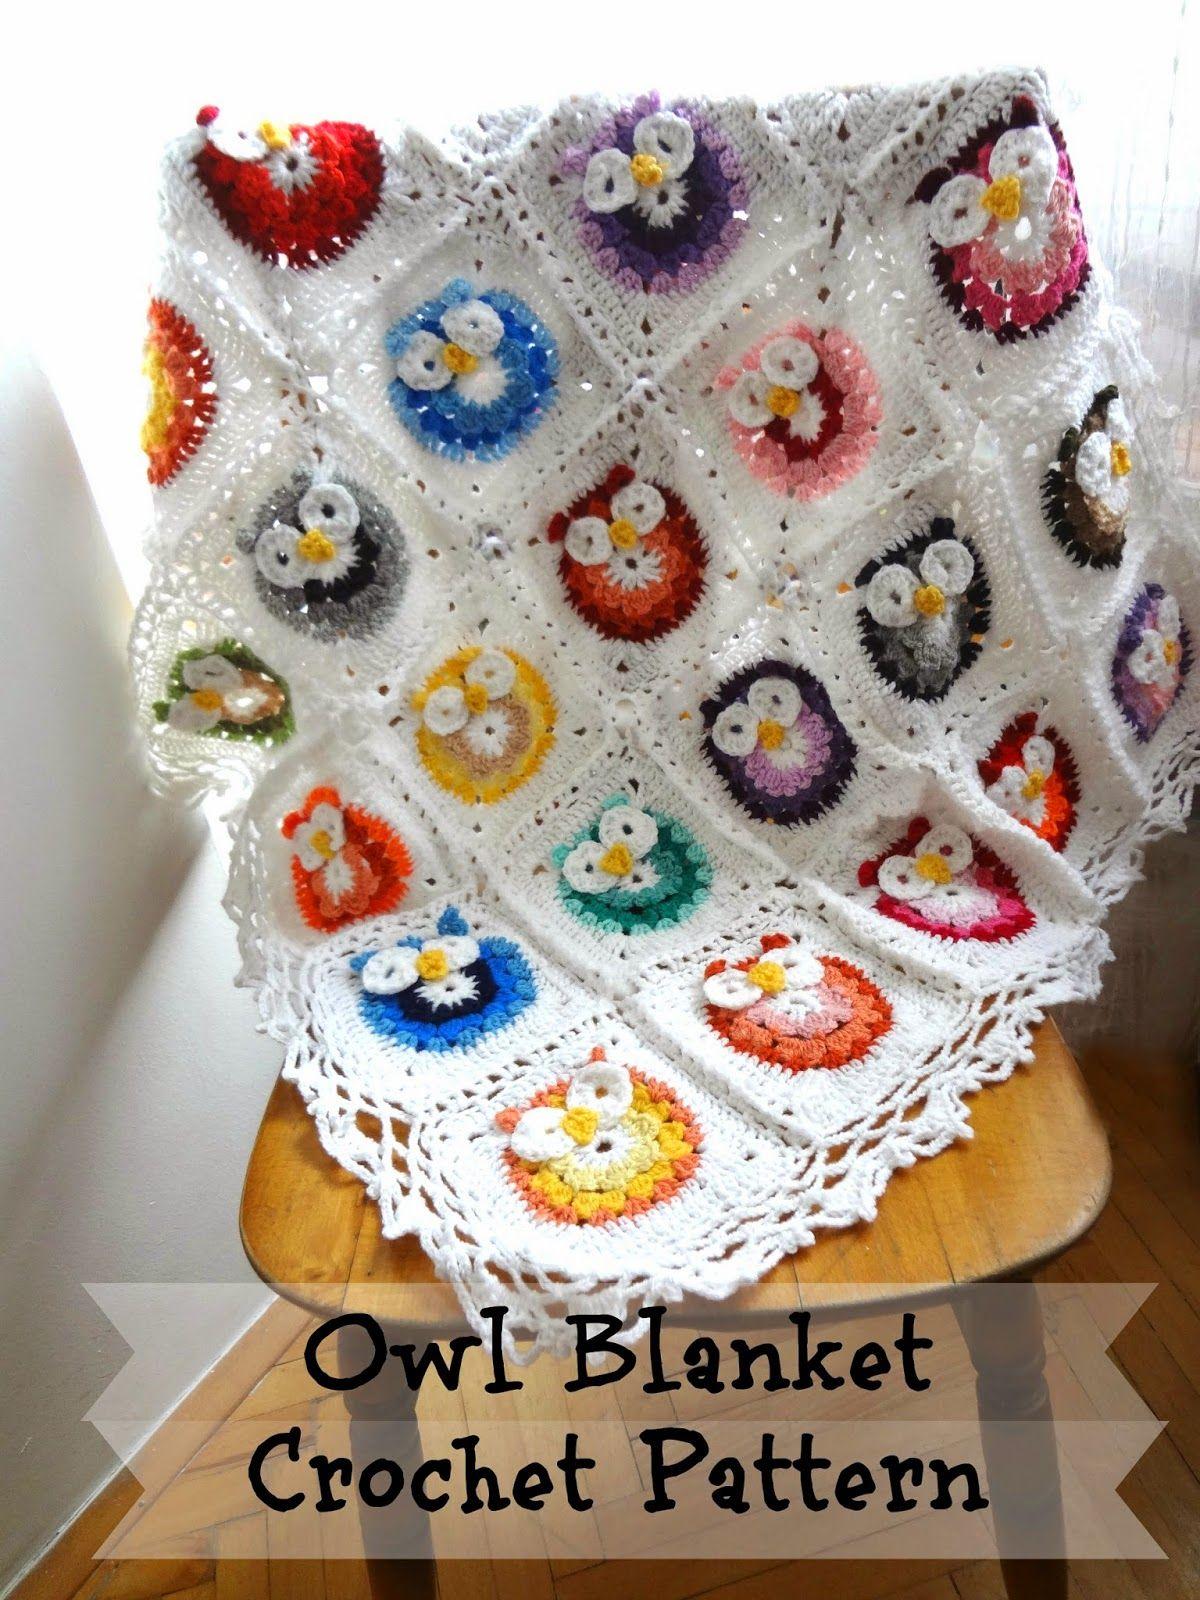 owl blanket crochet pattern | Crochet dreams of granduer | Pinterest ...